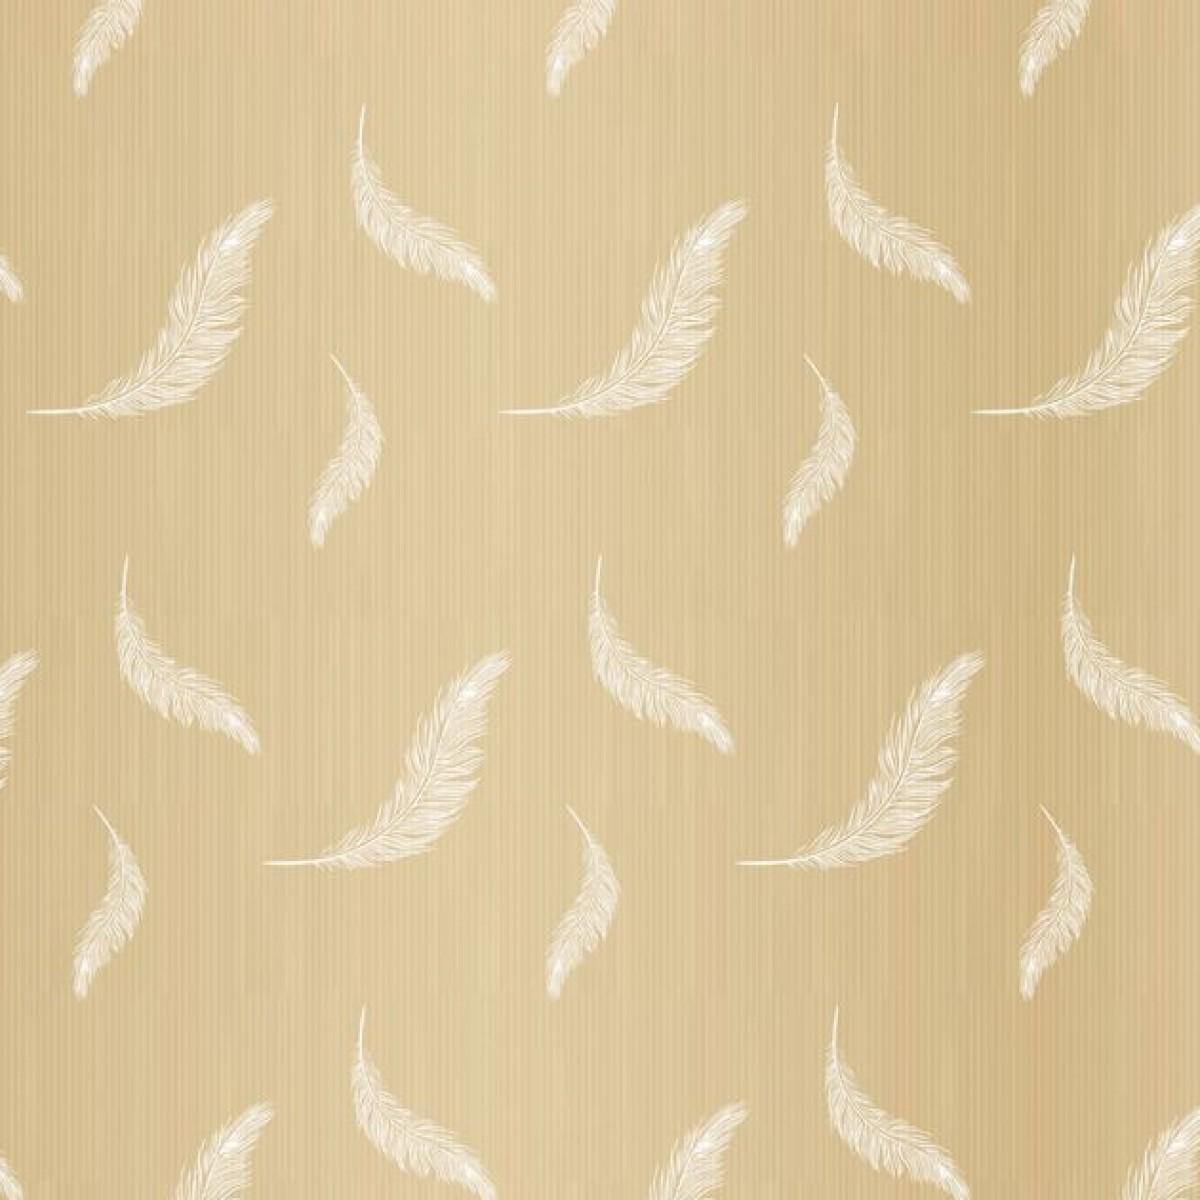 Feather Print White 50cmx25m Kraft Paper - 1 Roll